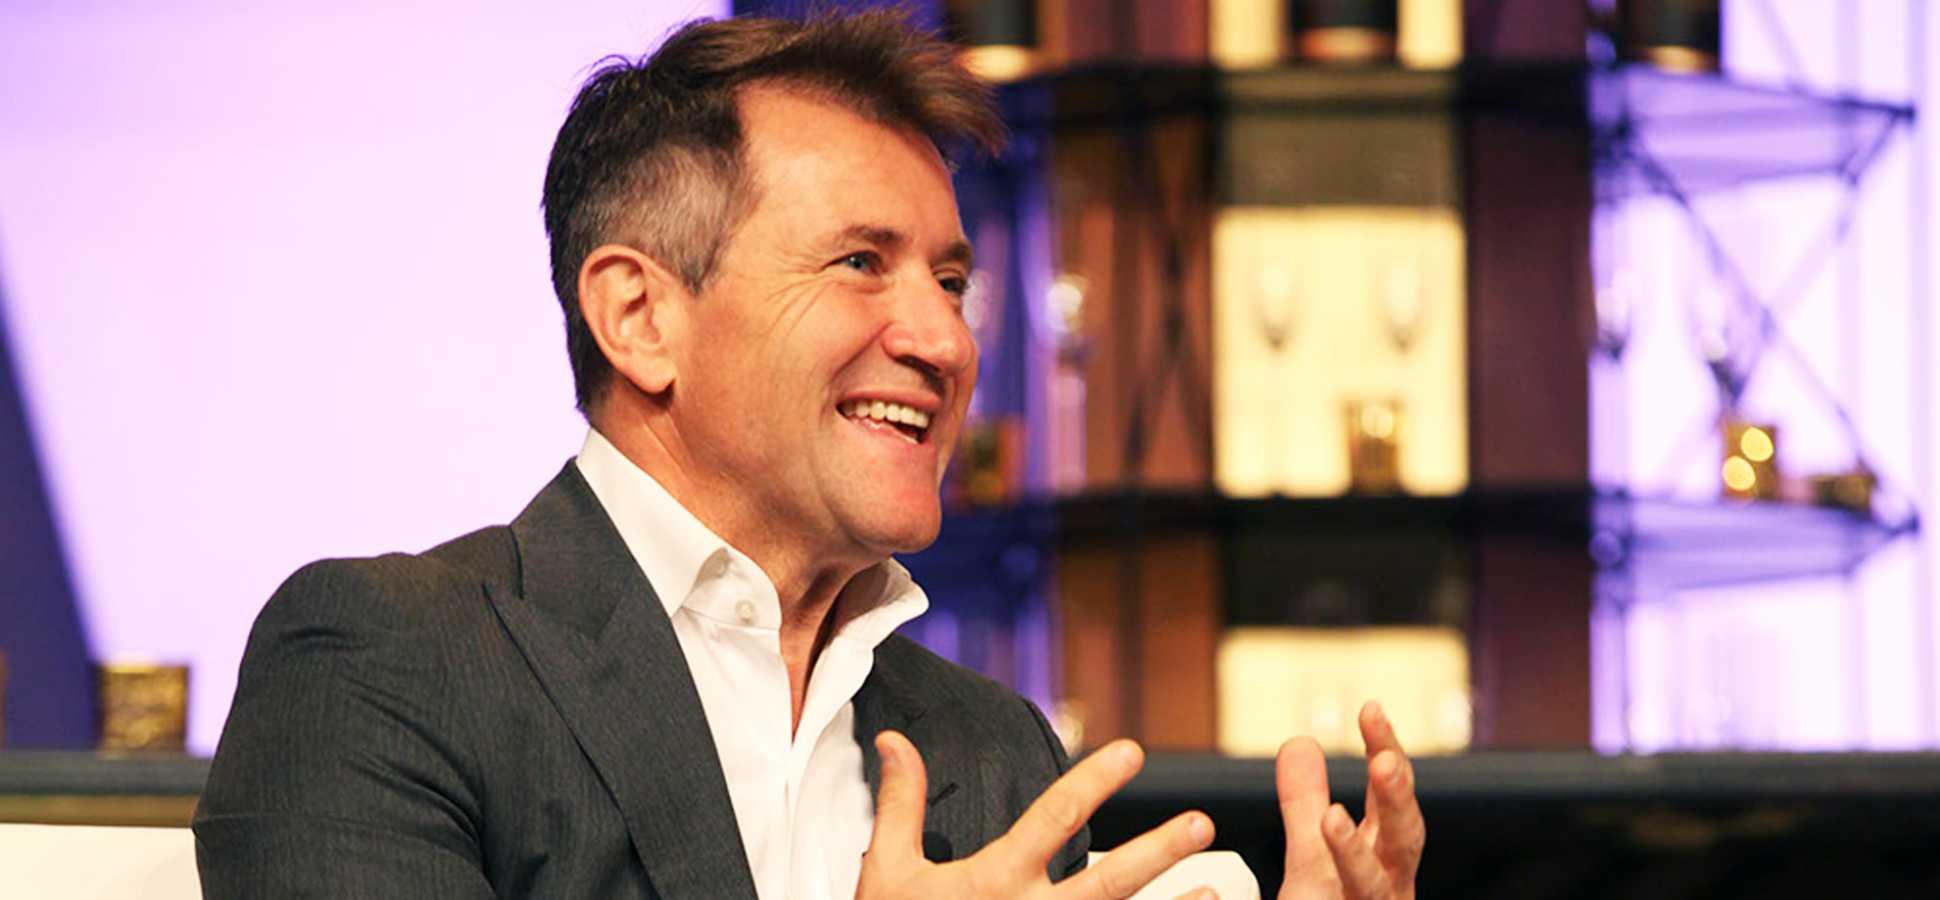 Shark Tank's Robert Herjavec: When Not to Sell Your Business